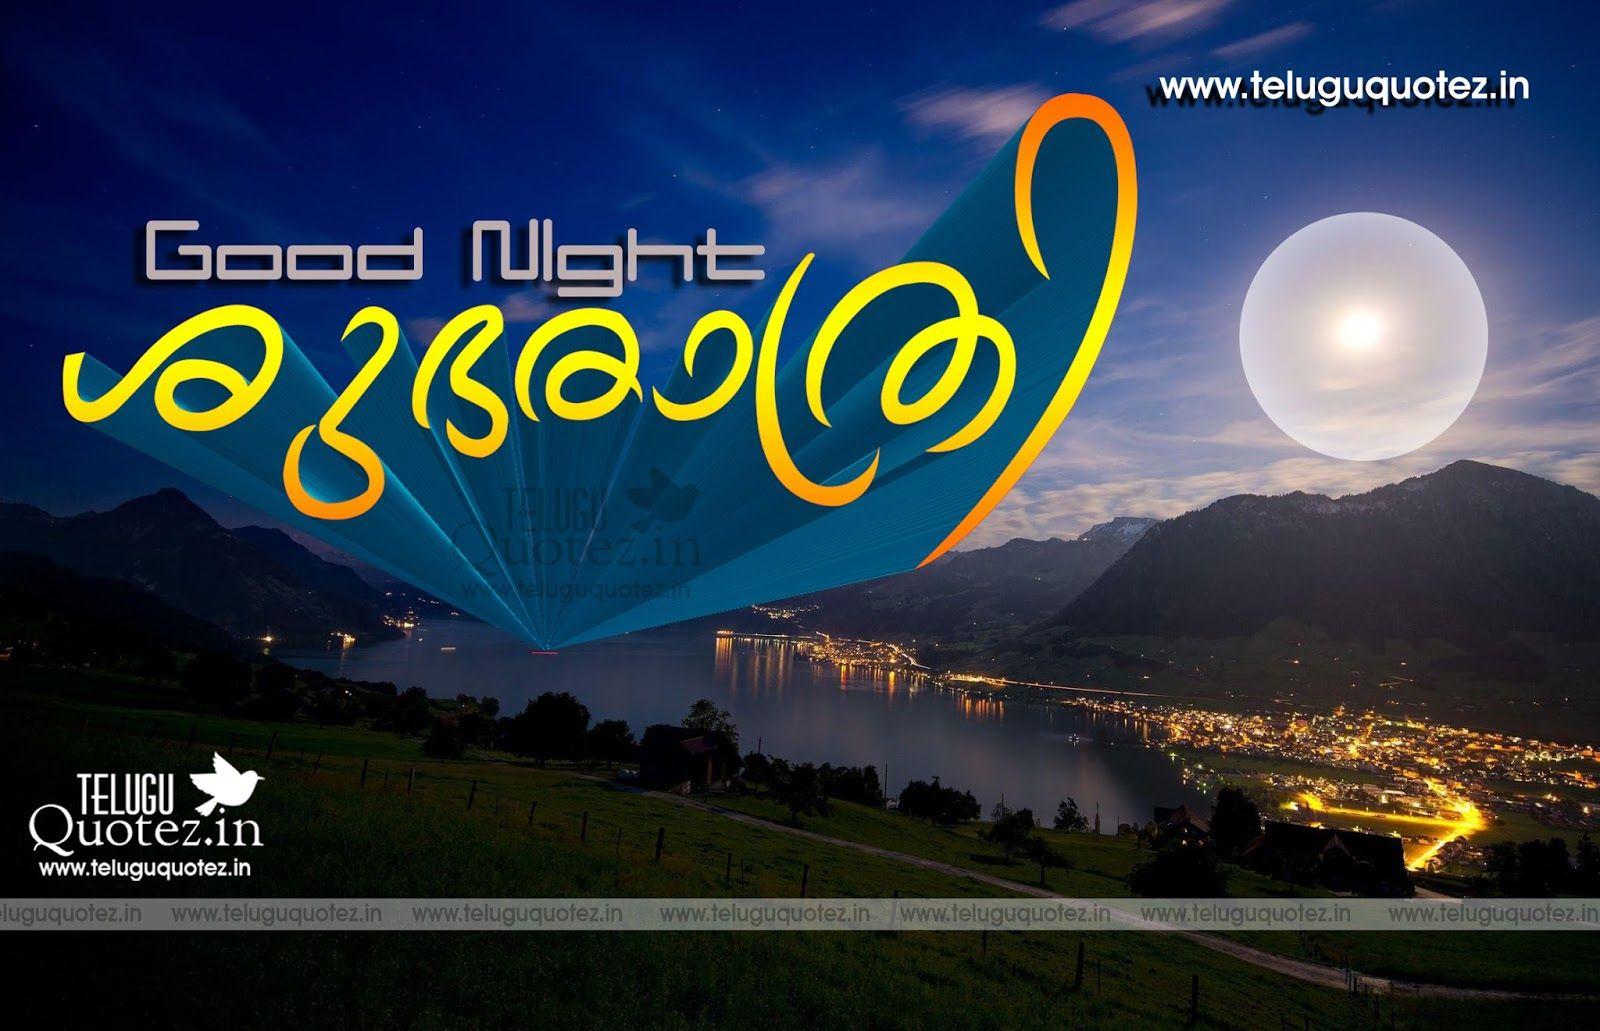 Good night friends malayalam baby good night friends malayalam baby kwikk altavistaventures Images